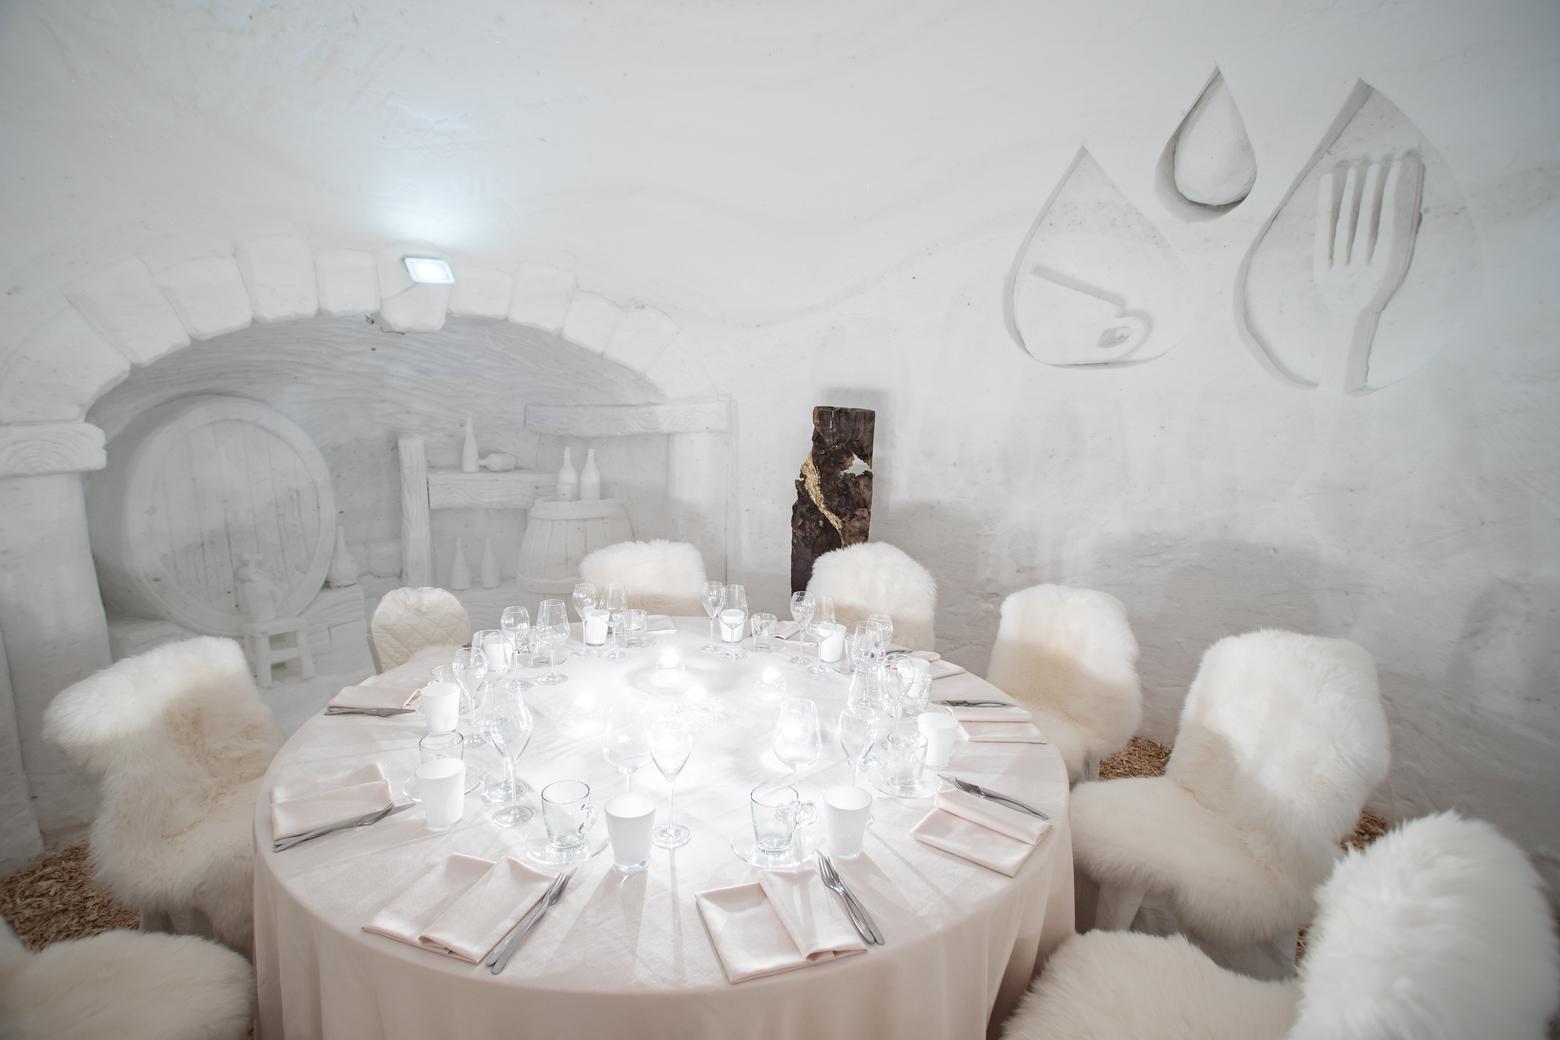 snow restaurant livigno